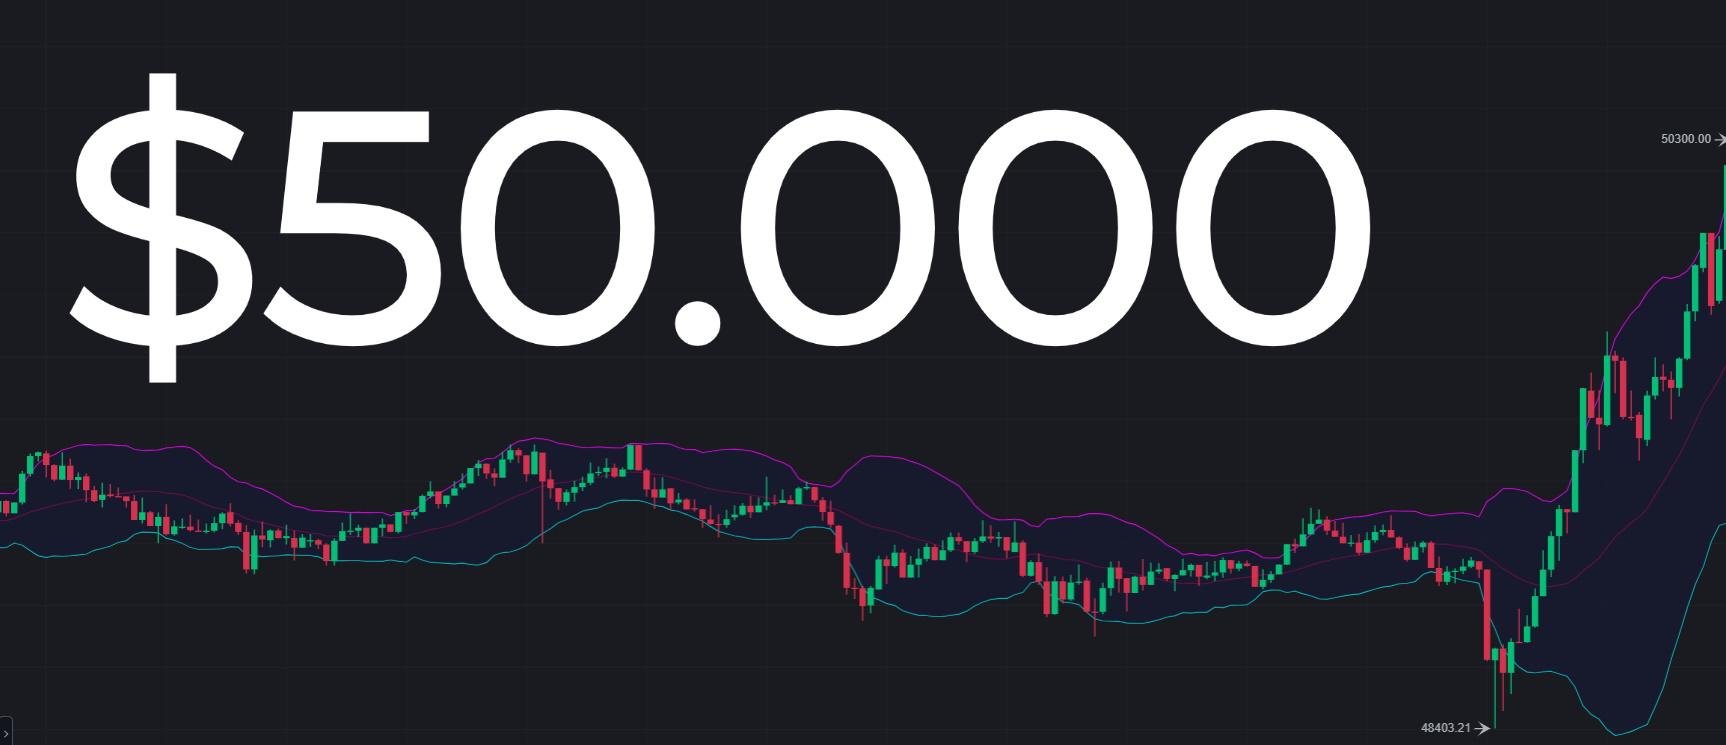 $50000 ATH